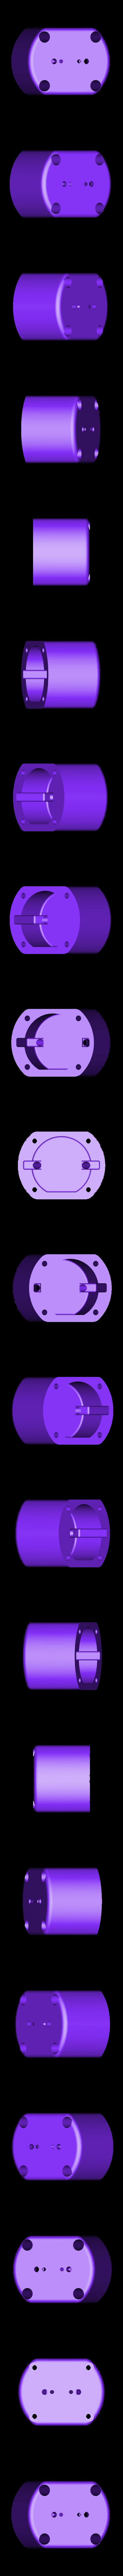 TAZER_V2_A.stl Download free STL file TAZER V2 • 3D printable object, MuSSy